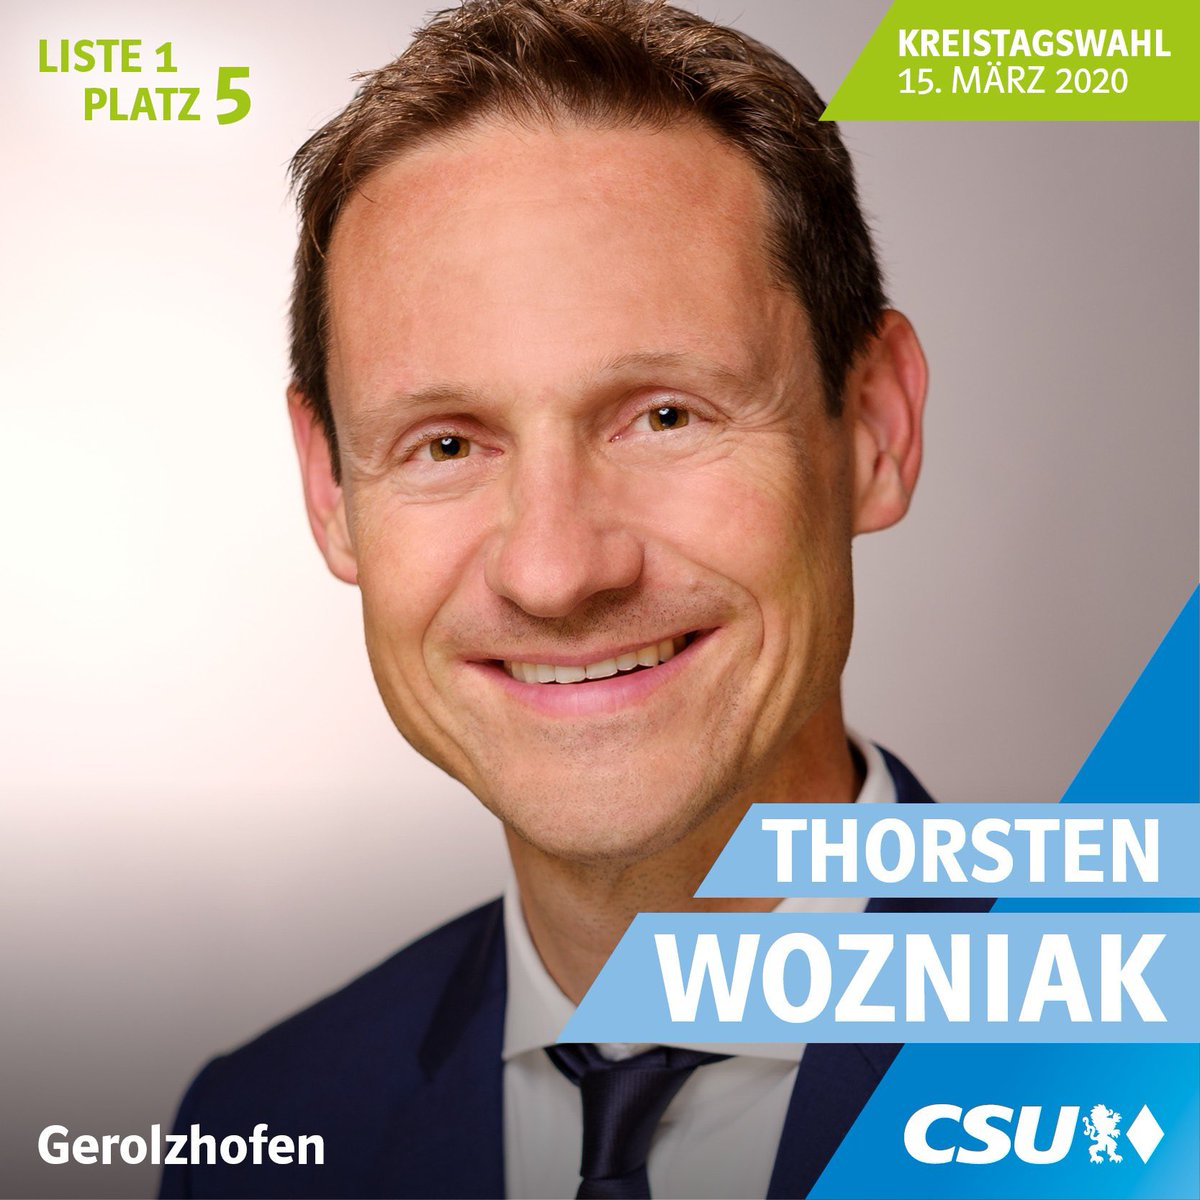 #Kreistagswahl #CSU #TeamZachmann #TeamWozniakpic.twitter.com/XyeILMUpnb